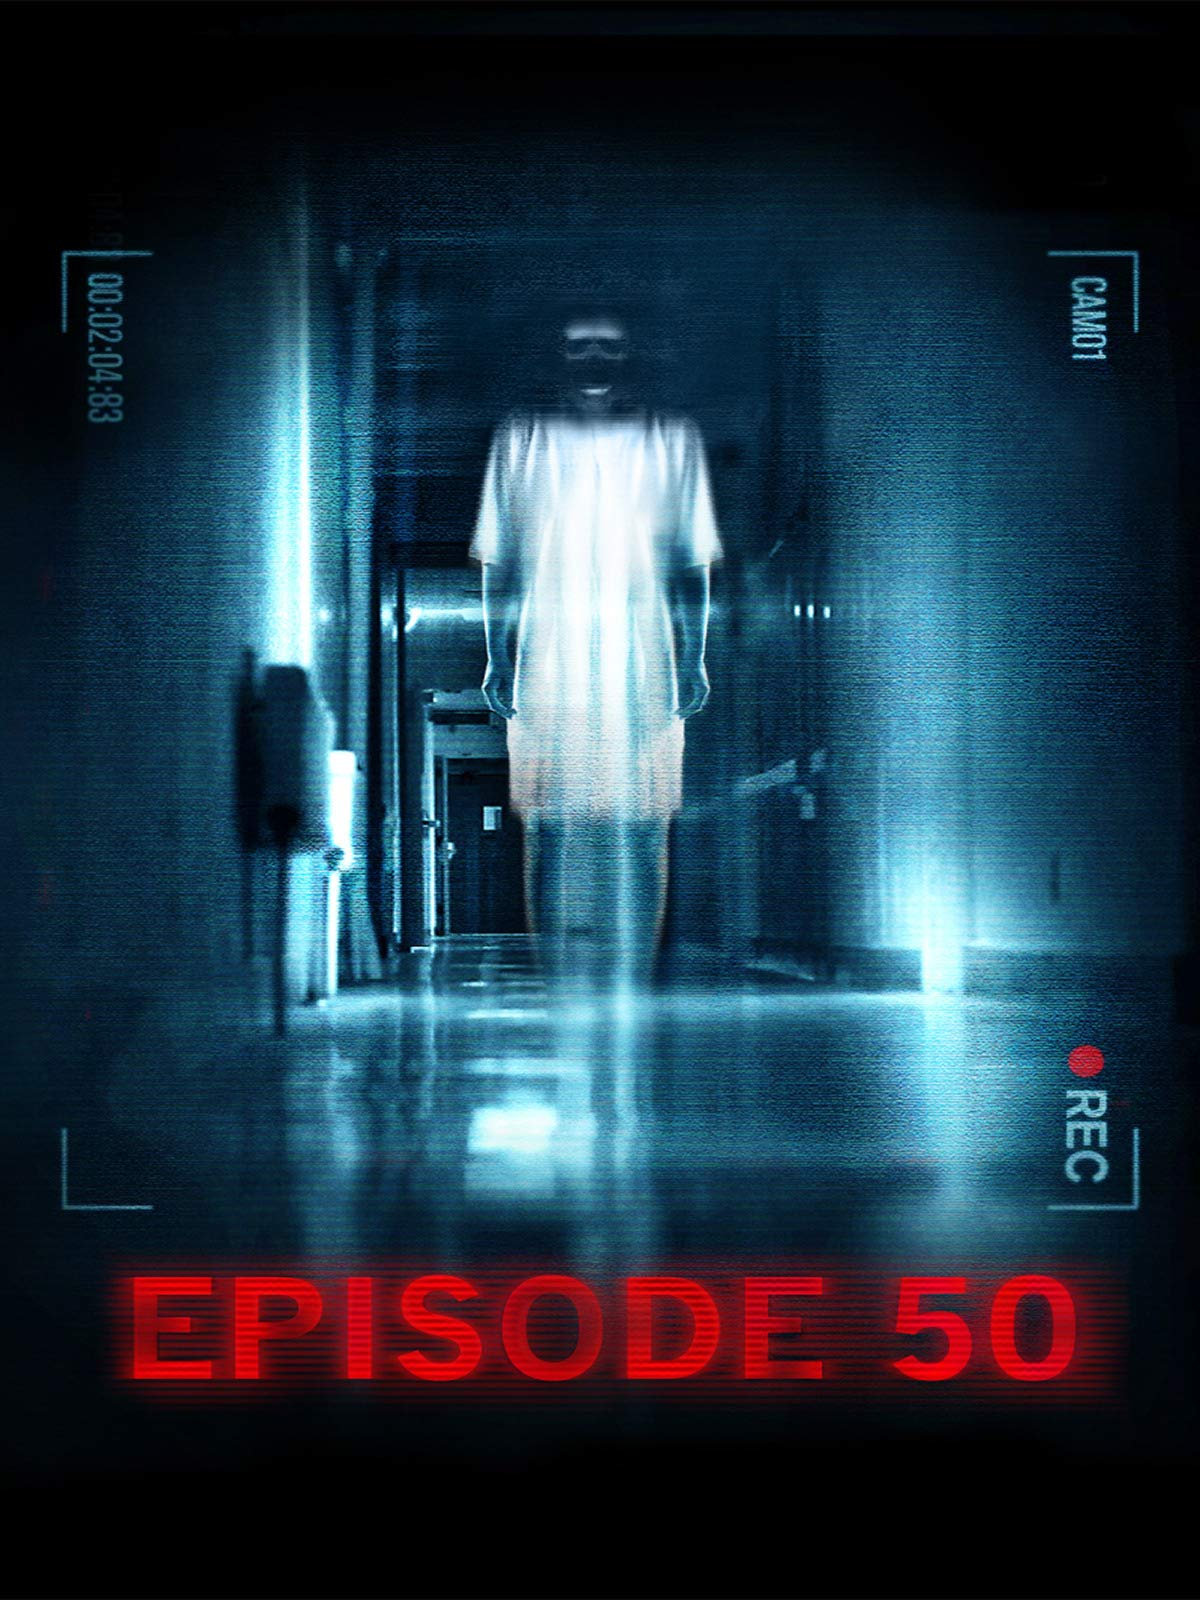 Episode 50 on Amazon Prime Video UK